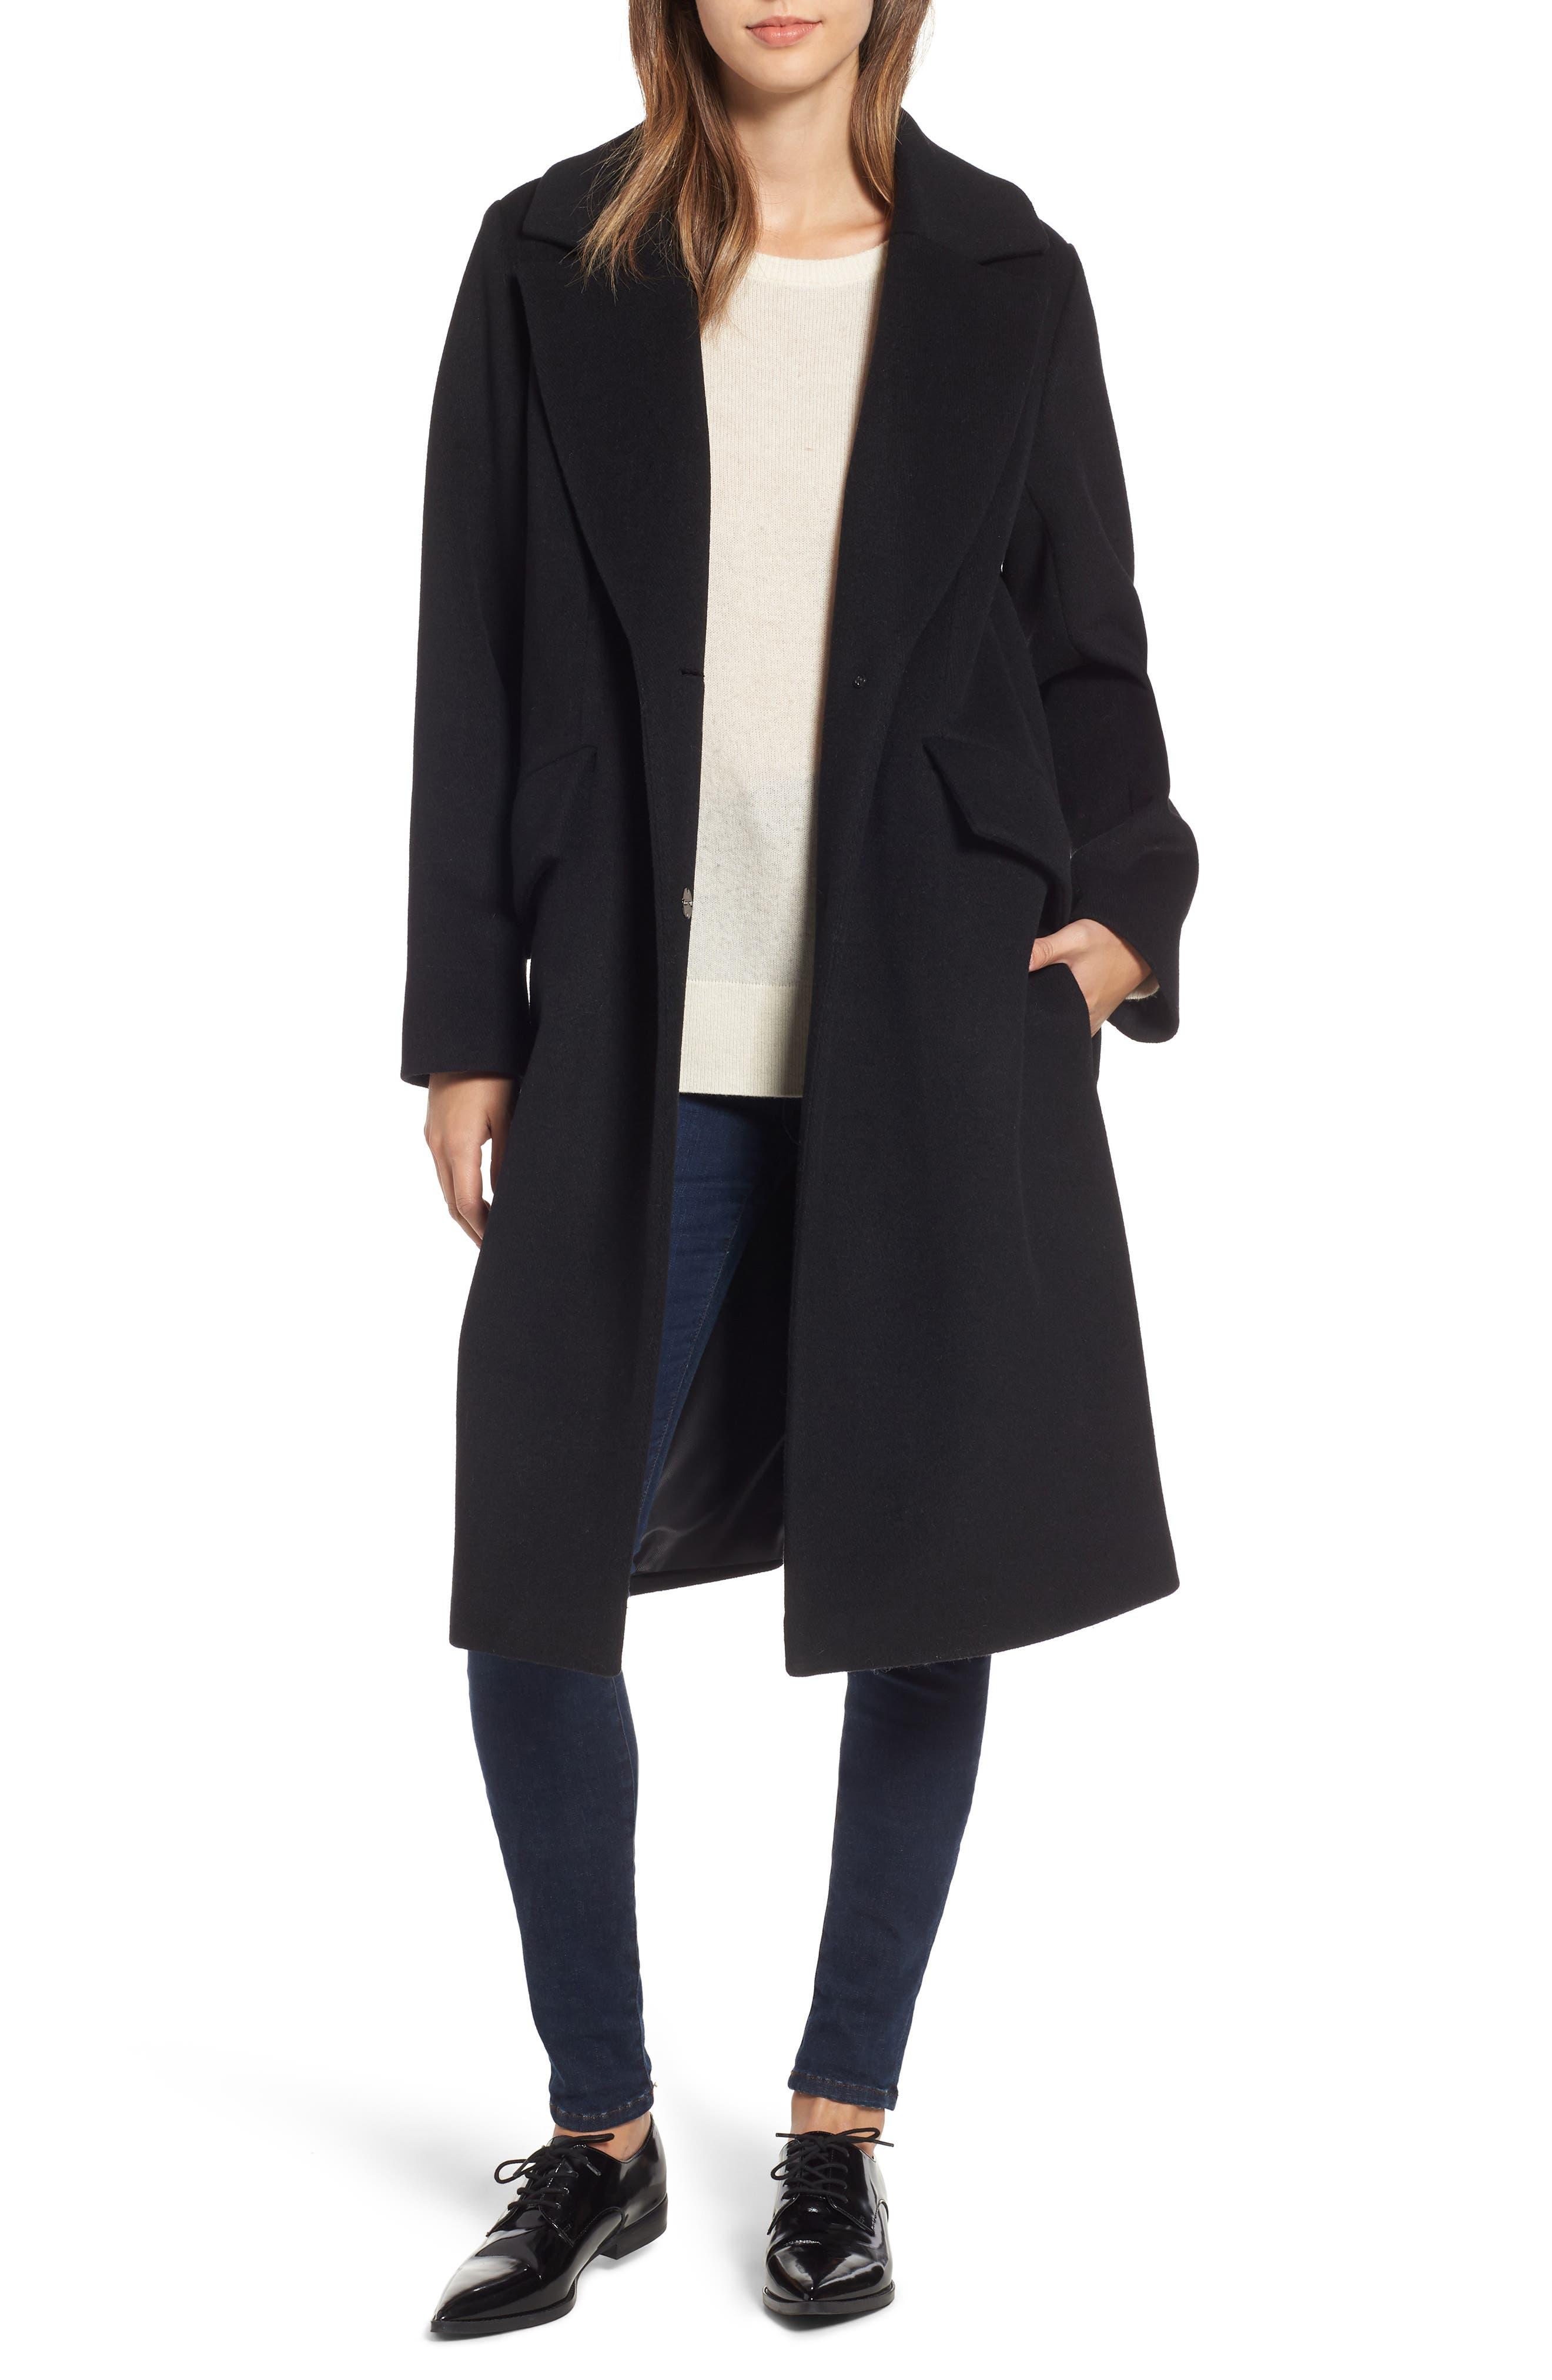 RACHEL RACHEL ROY Wool Blend Coat, Main, color, BLACK